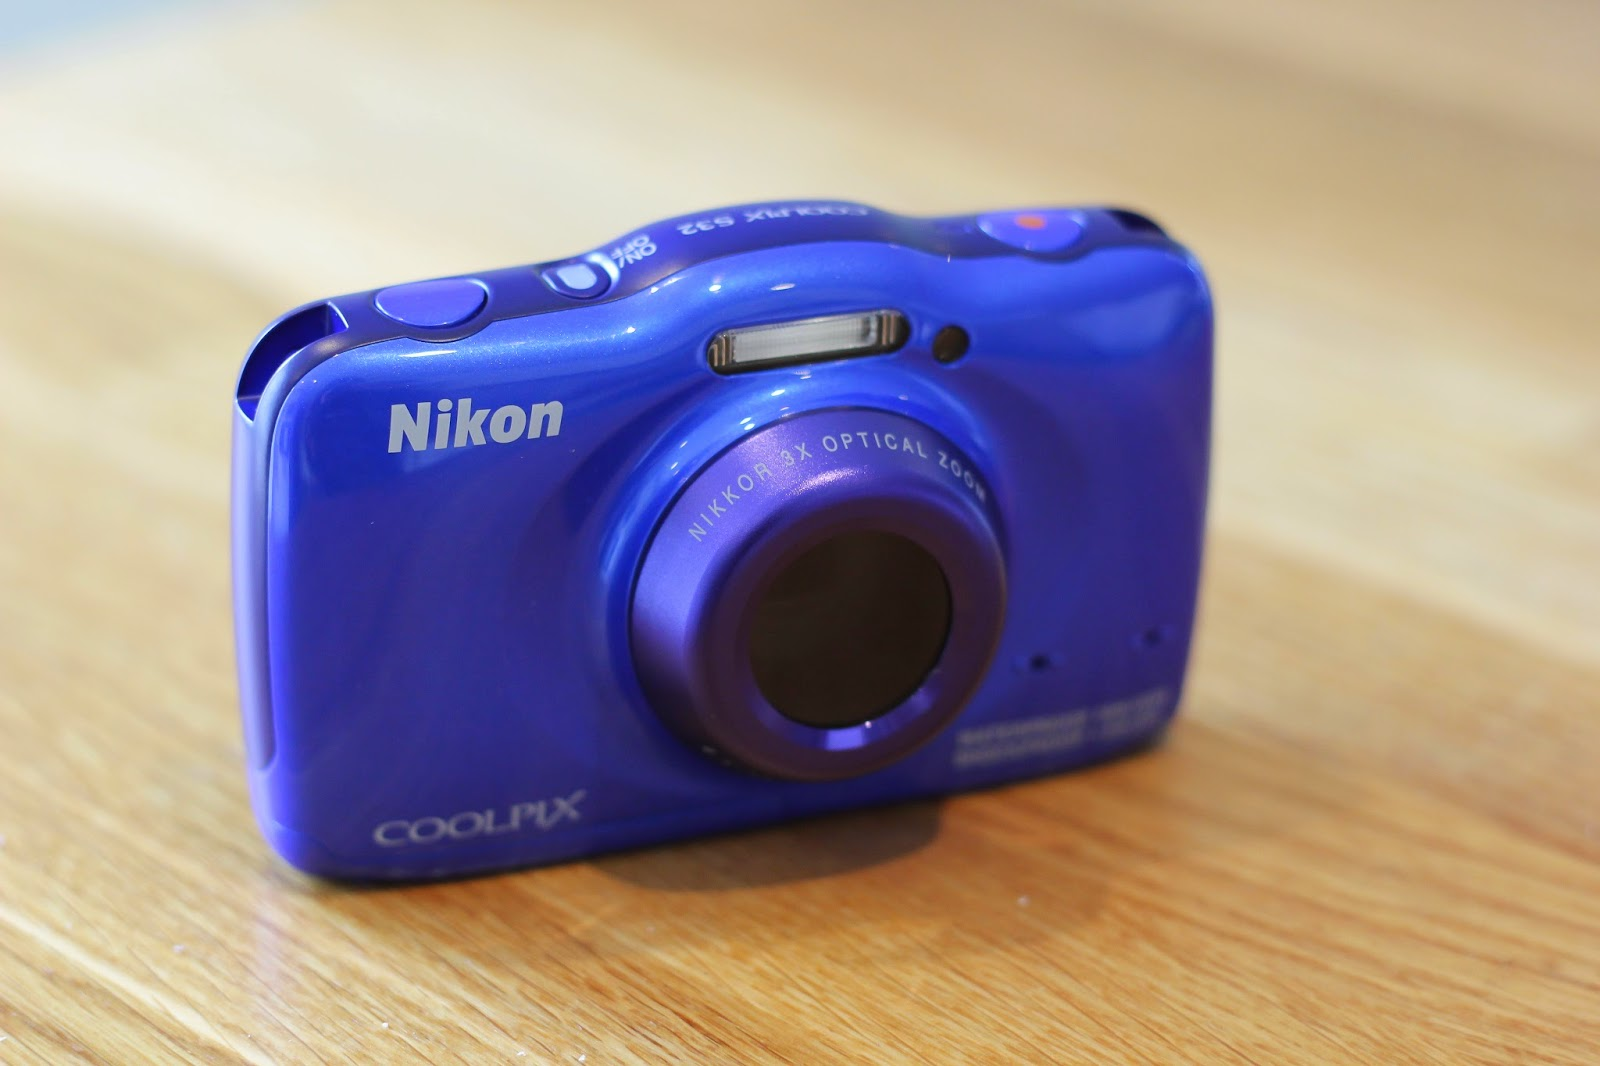 Nikon child's camera